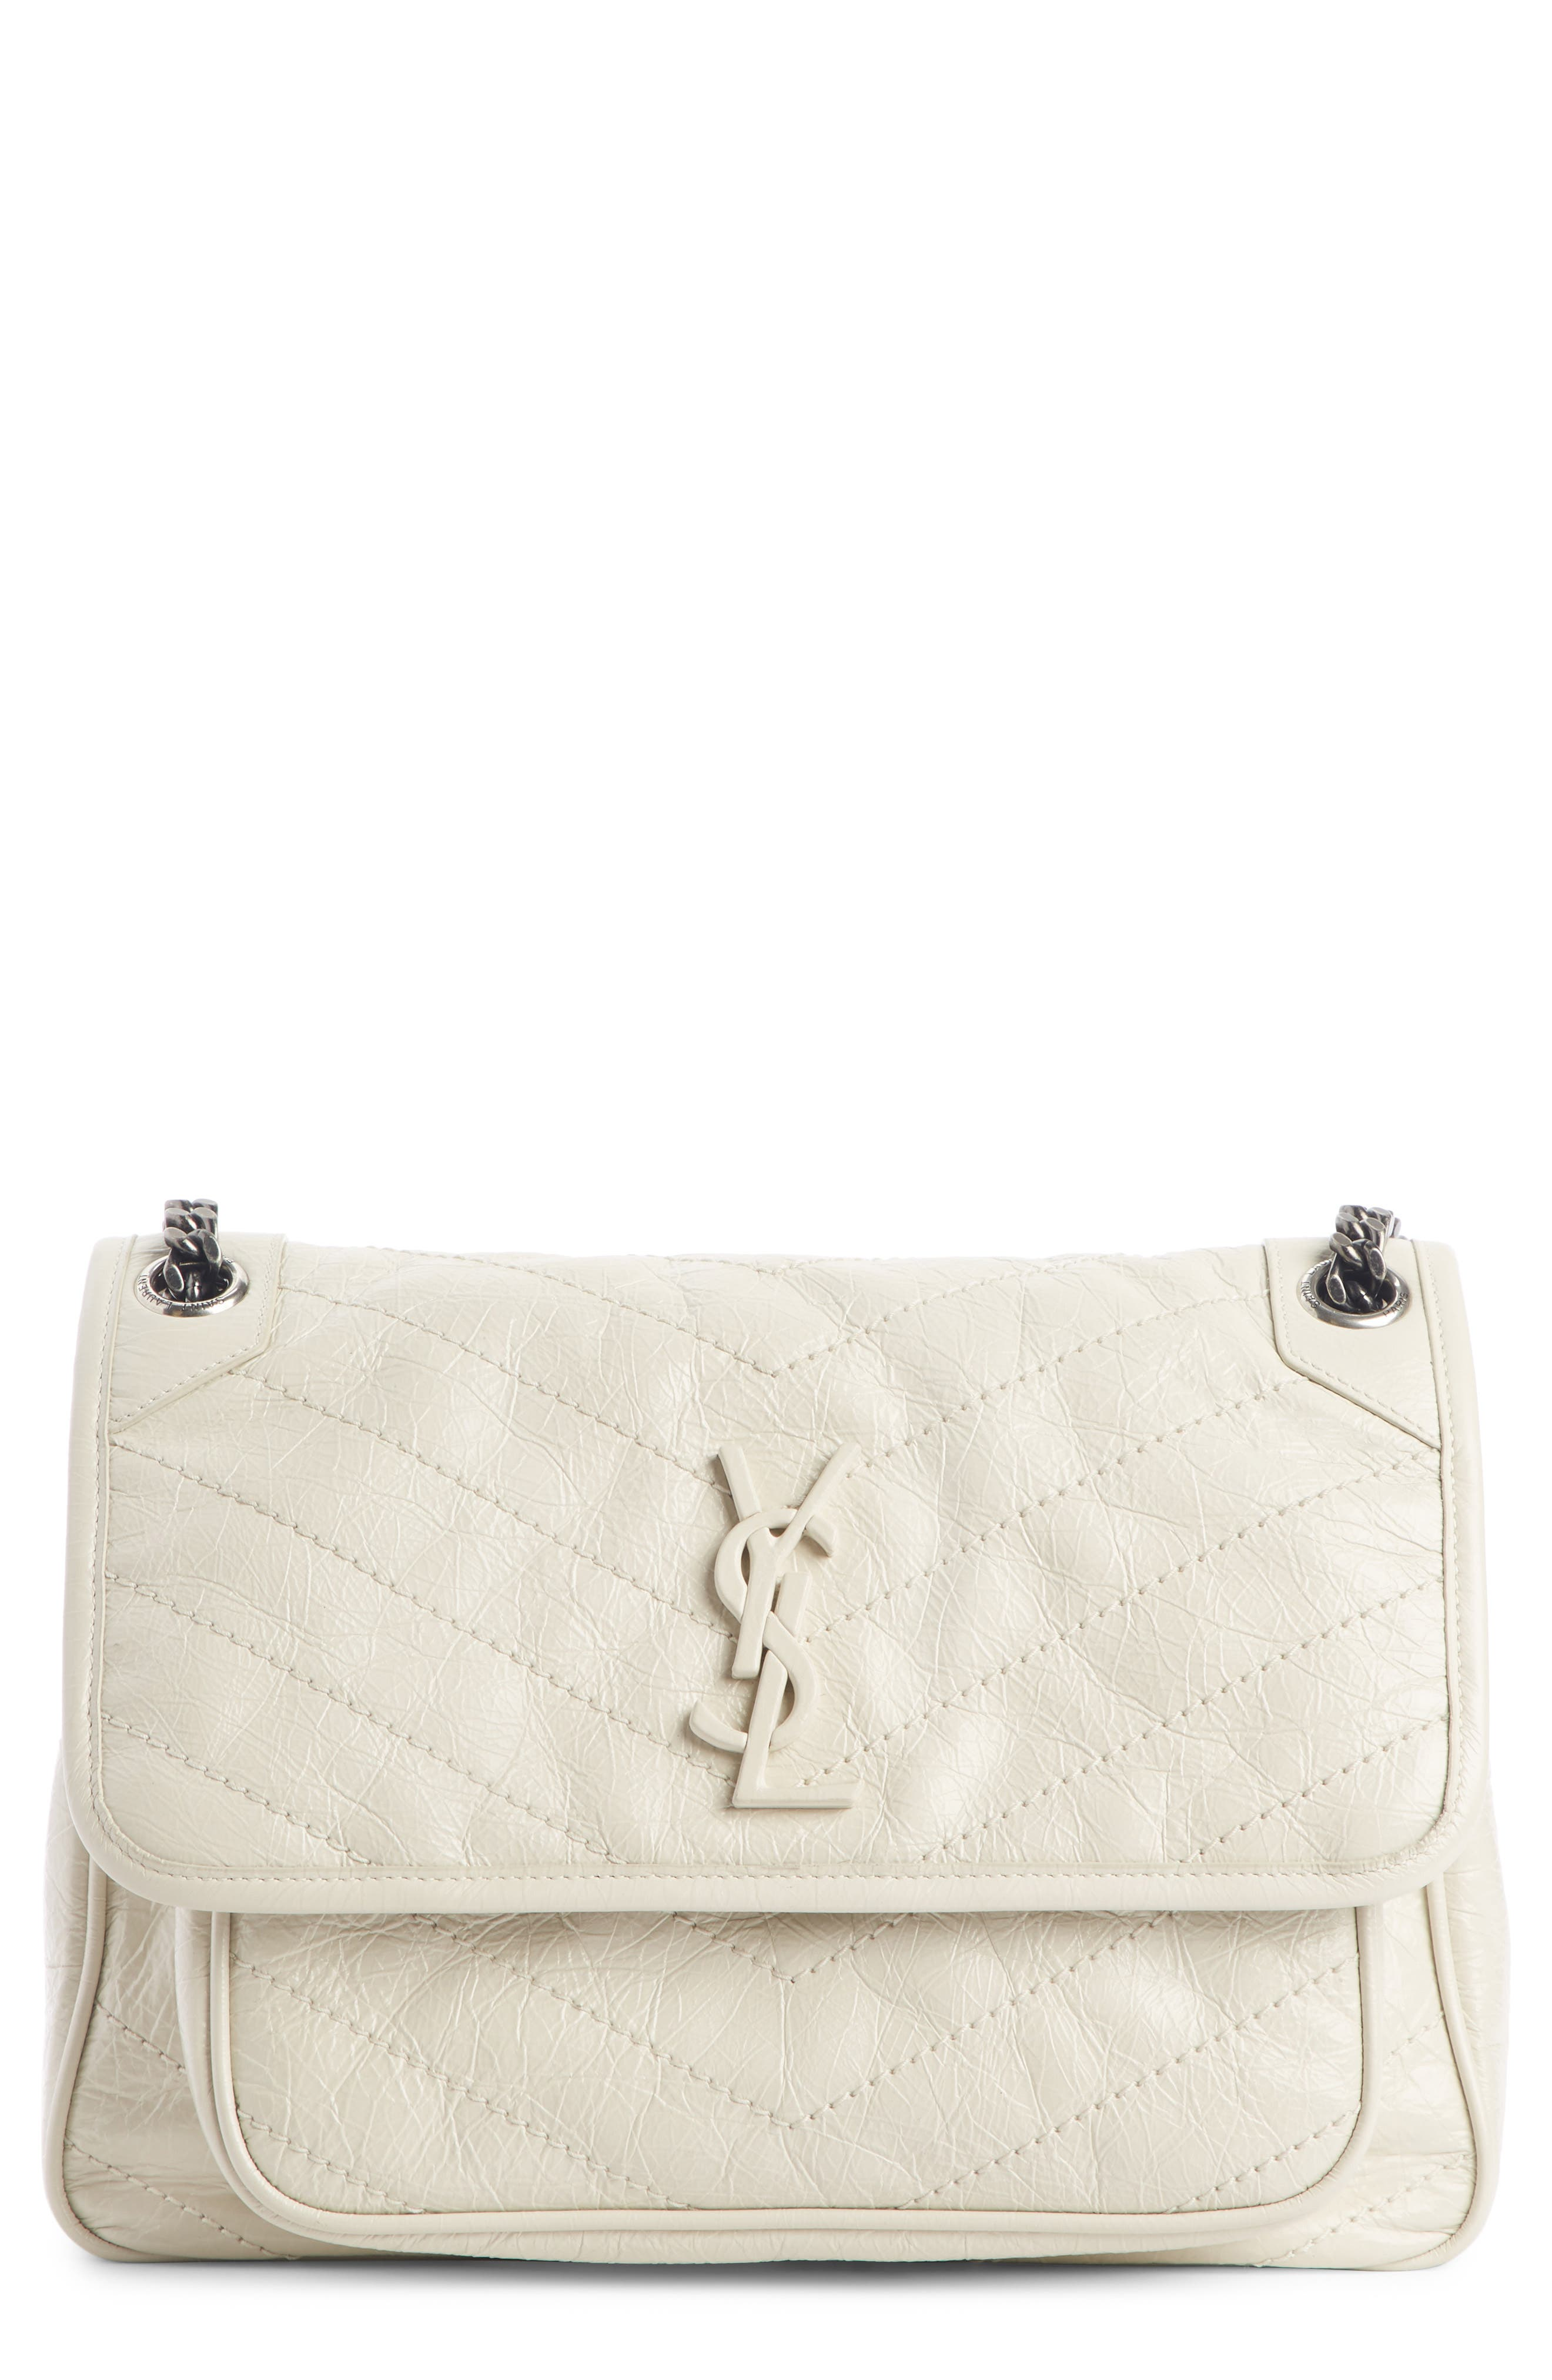 SAINT LAURENT, Medium Niki Leather Shoulder Bag, Main thumbnail 1, color, CREMA SOFT